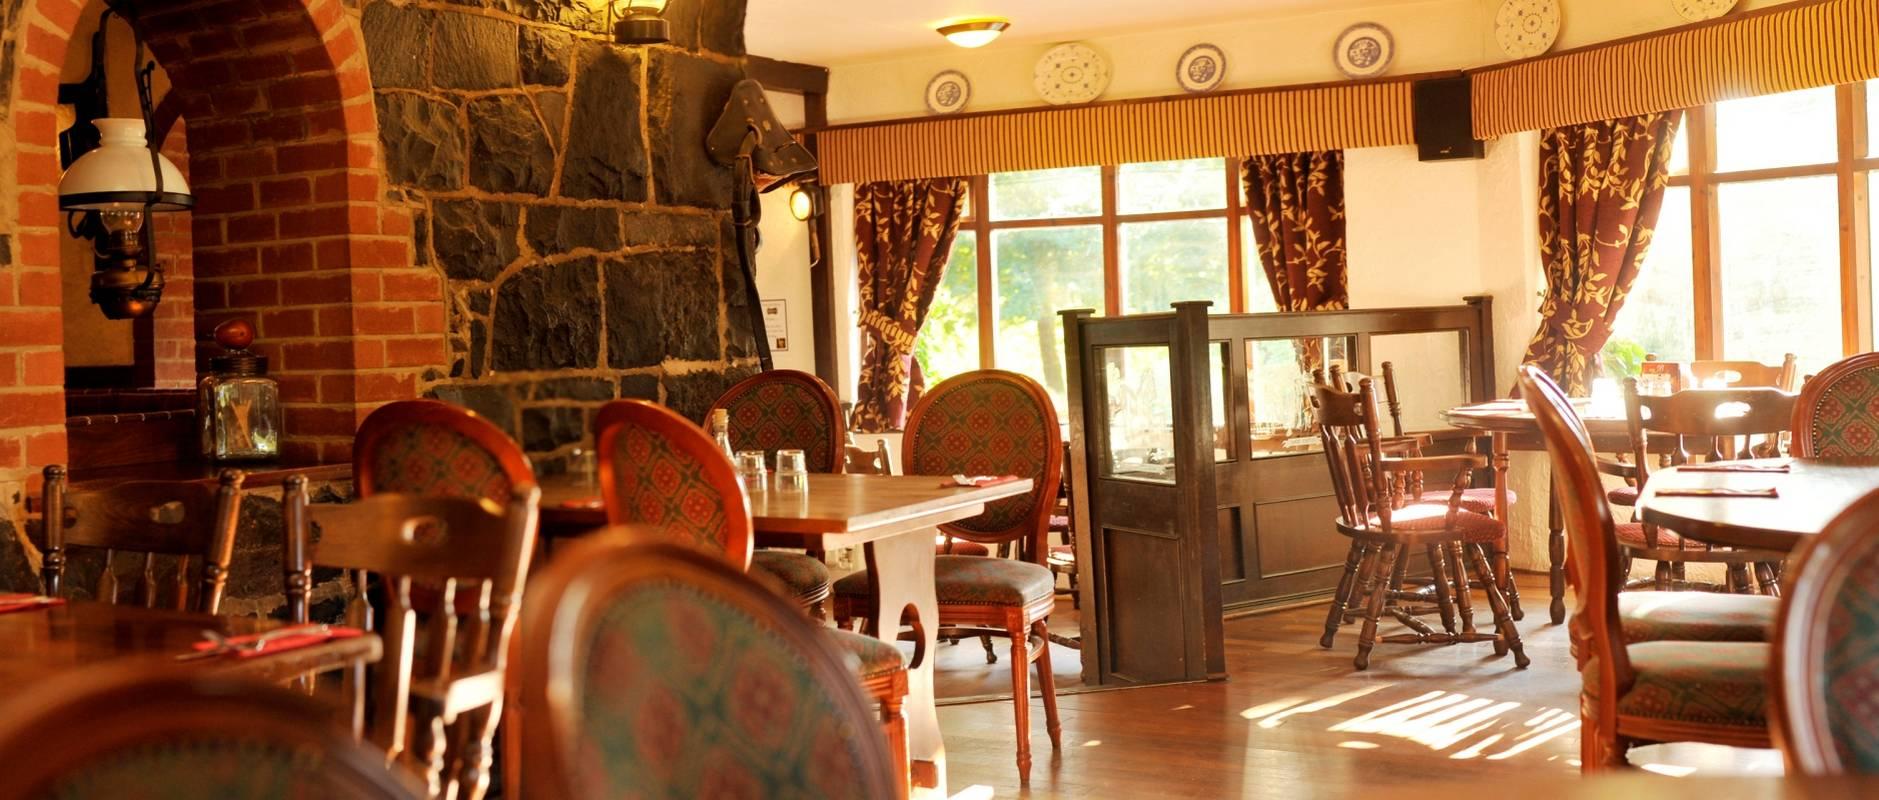 Restaurant venue Bushtown Hotel Coleraine